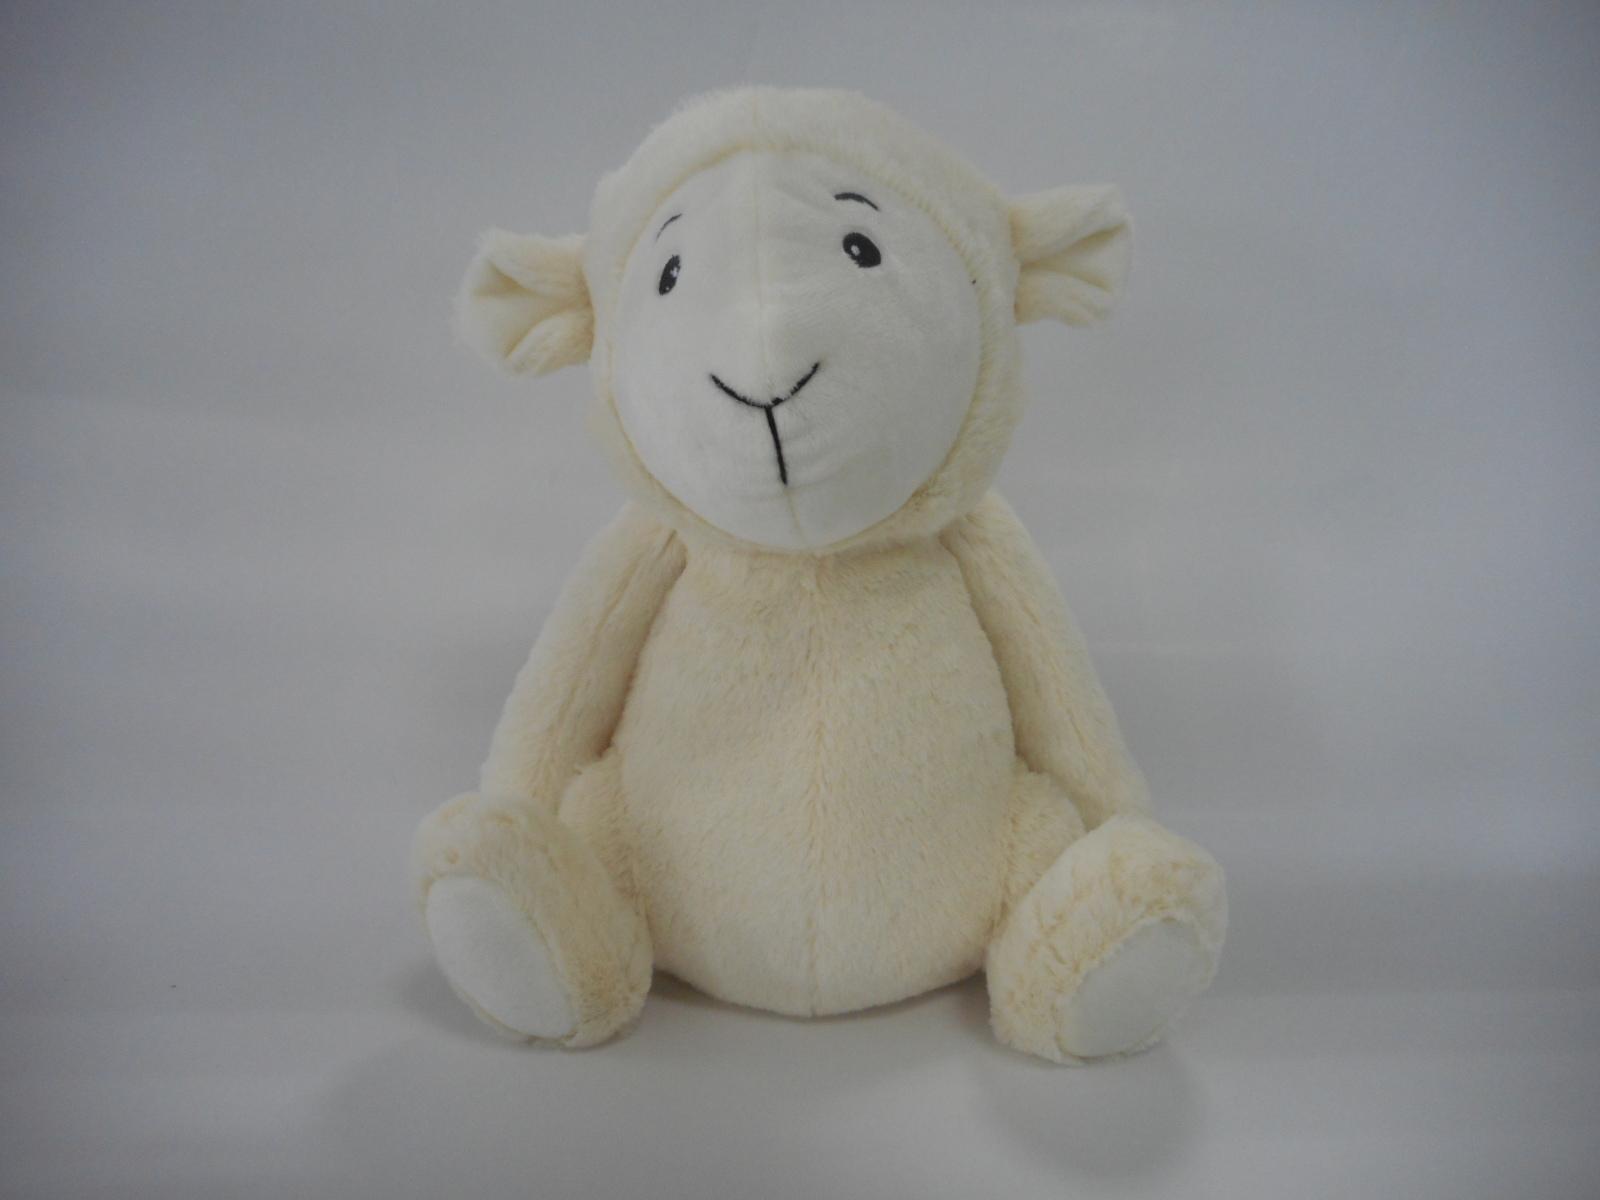 b474ed642967 Wholesale And Custom Various Sitting Position Plush Toy Animals ...